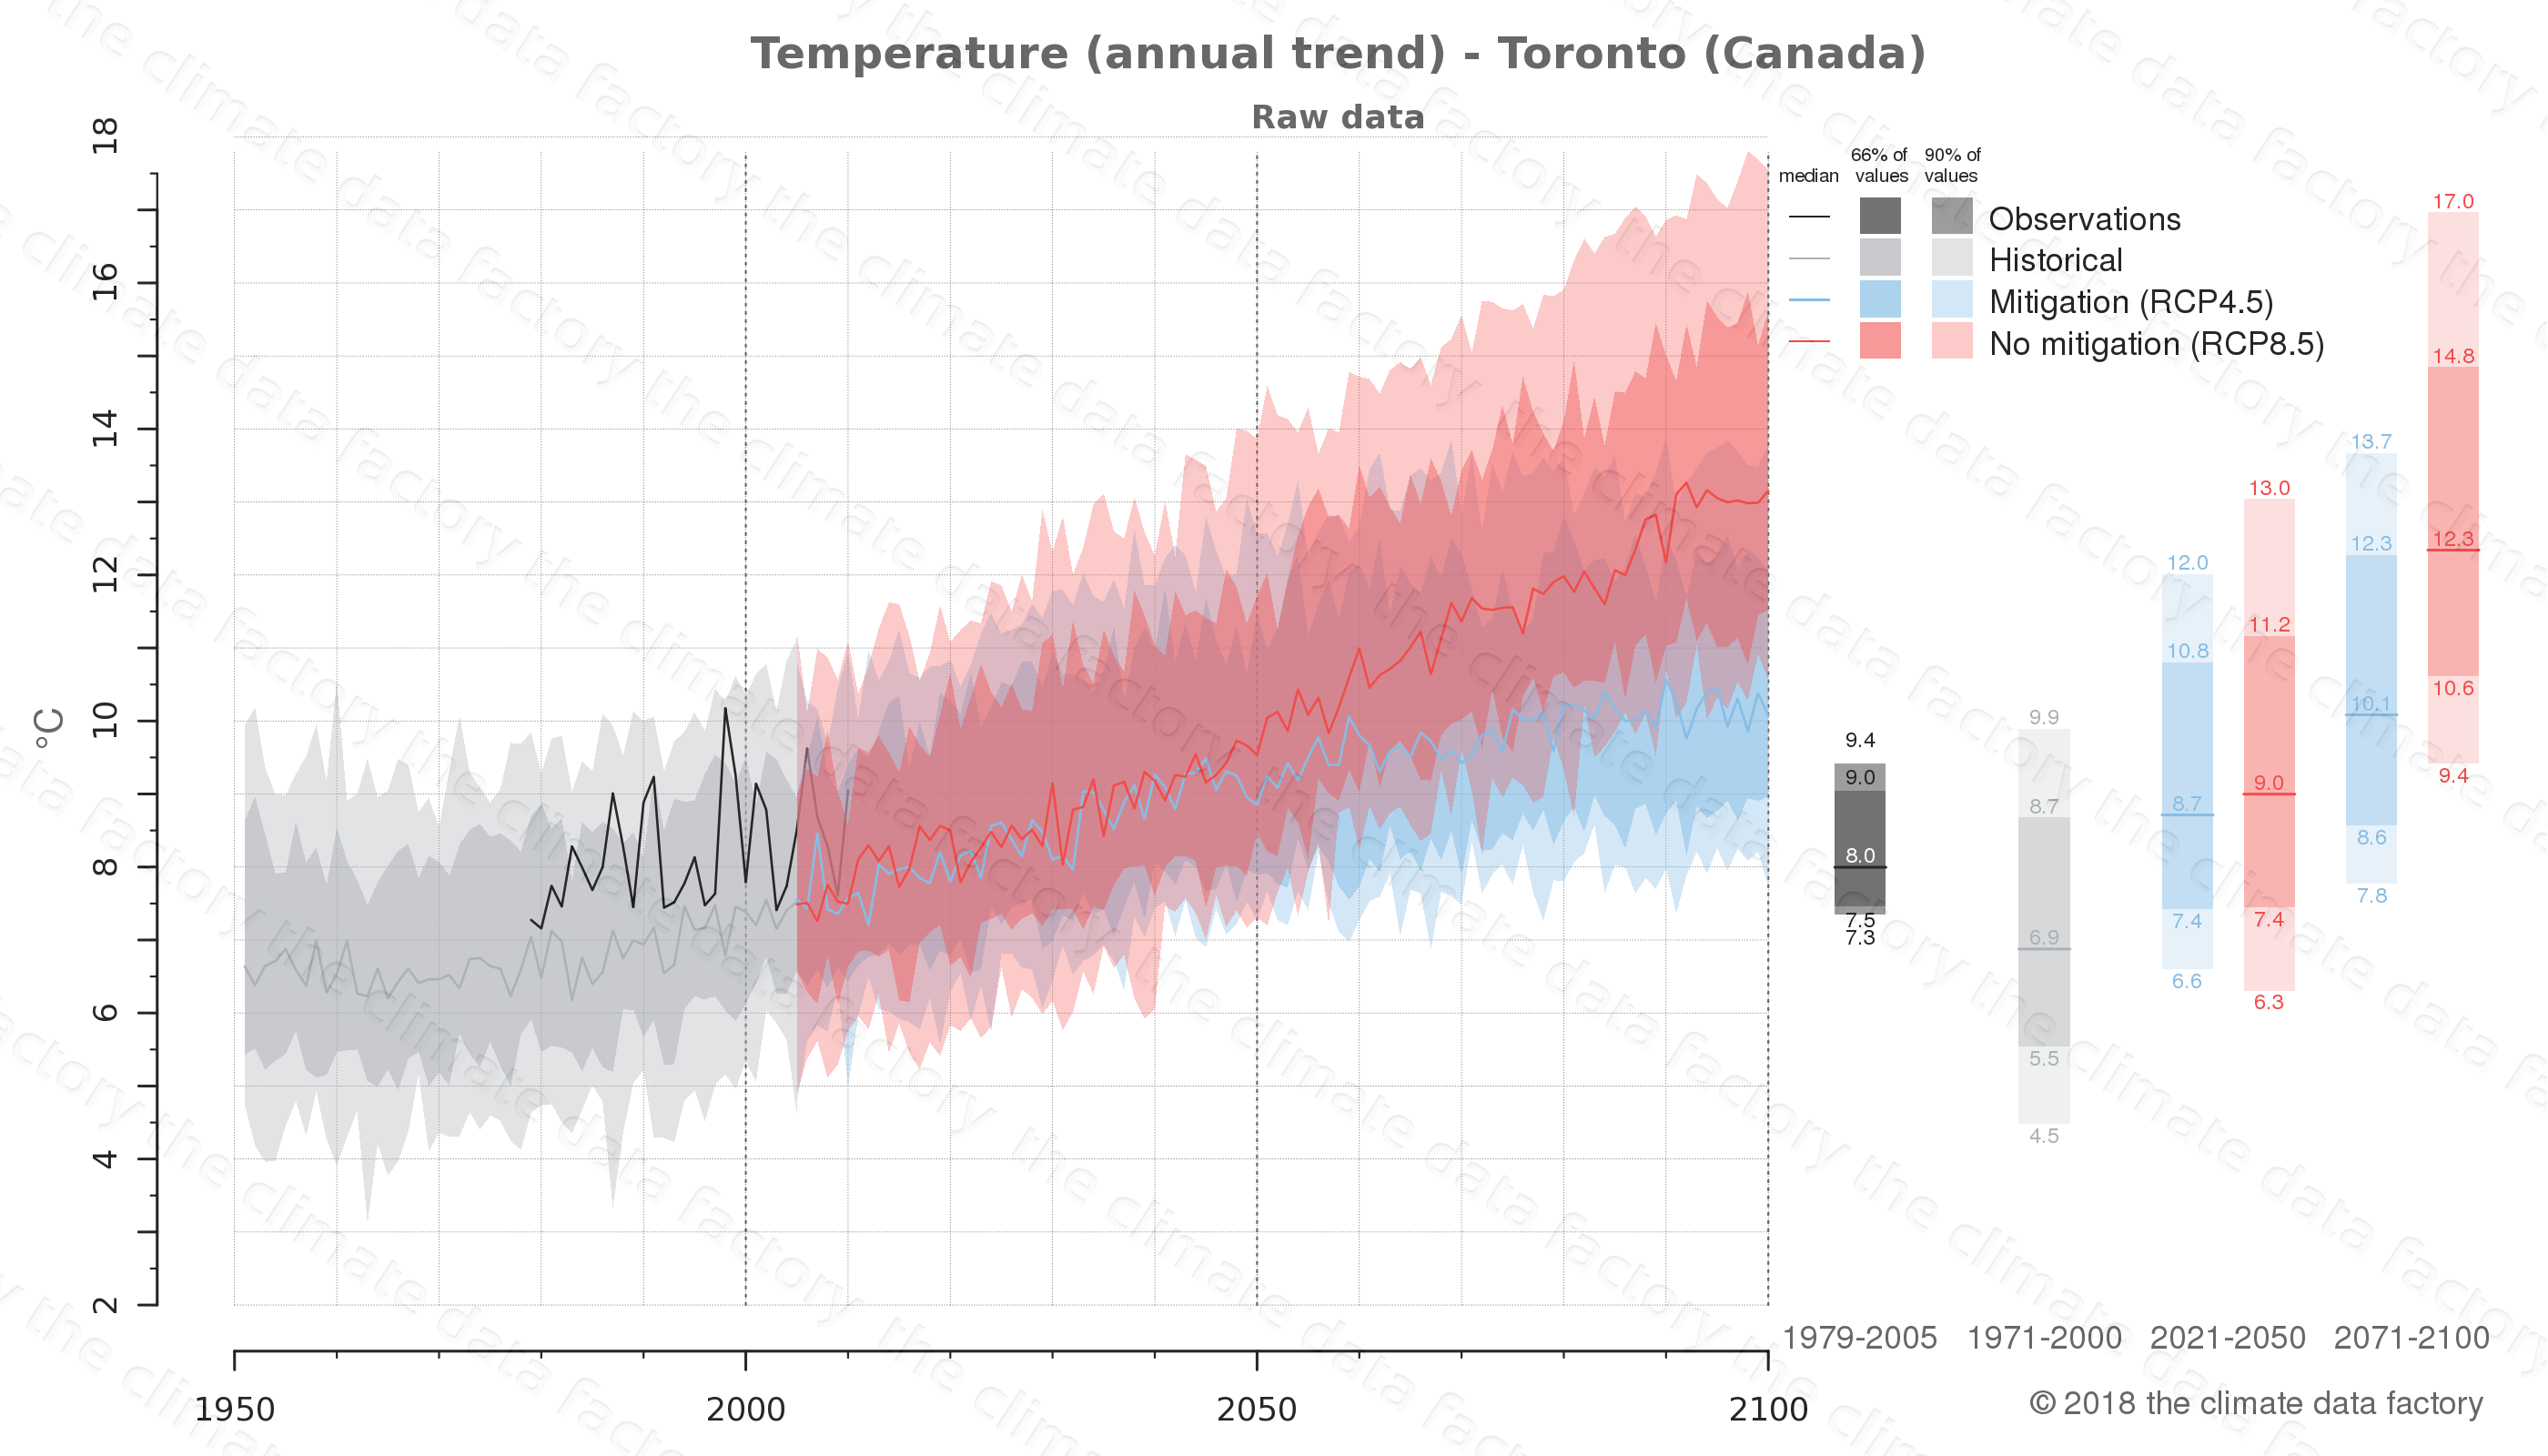 climate change data policy adaptation climate graph city data temperature toronto canada